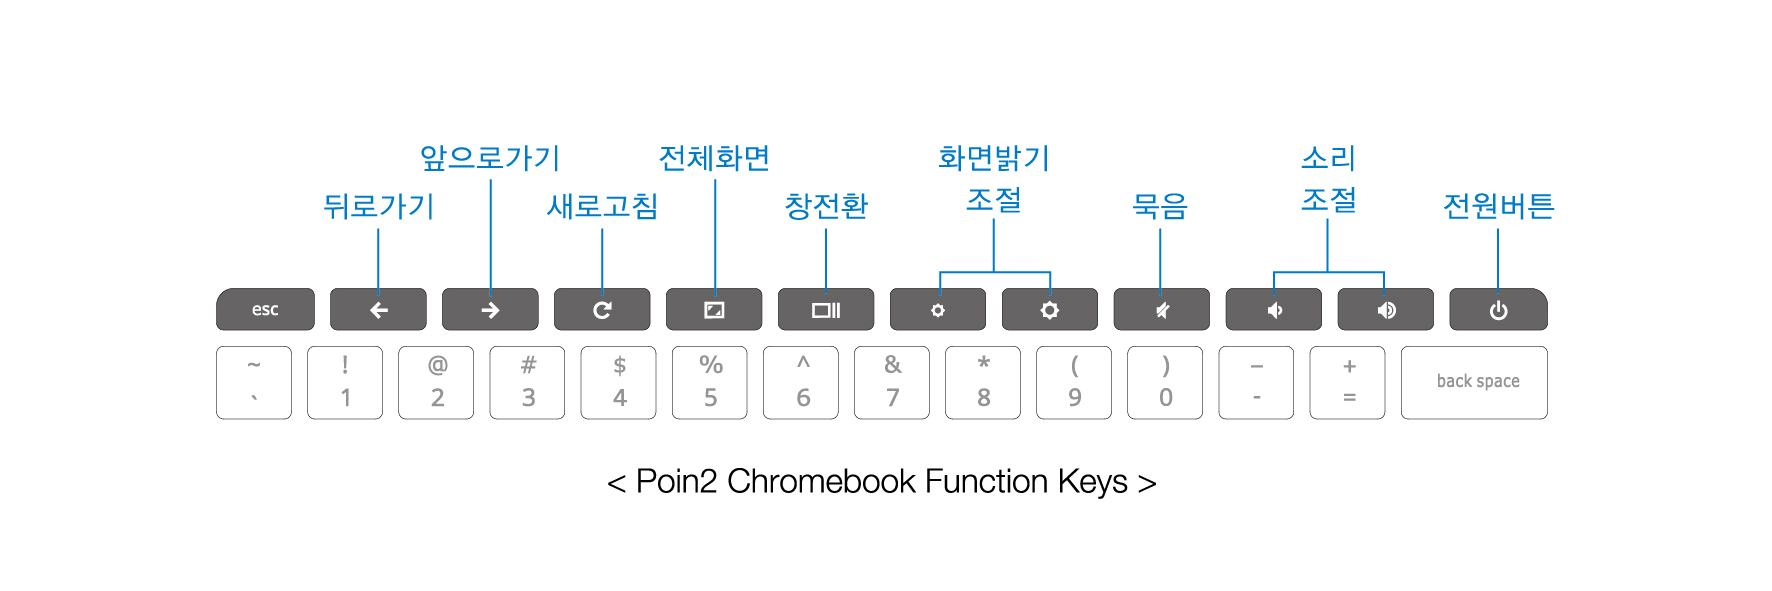 f keys